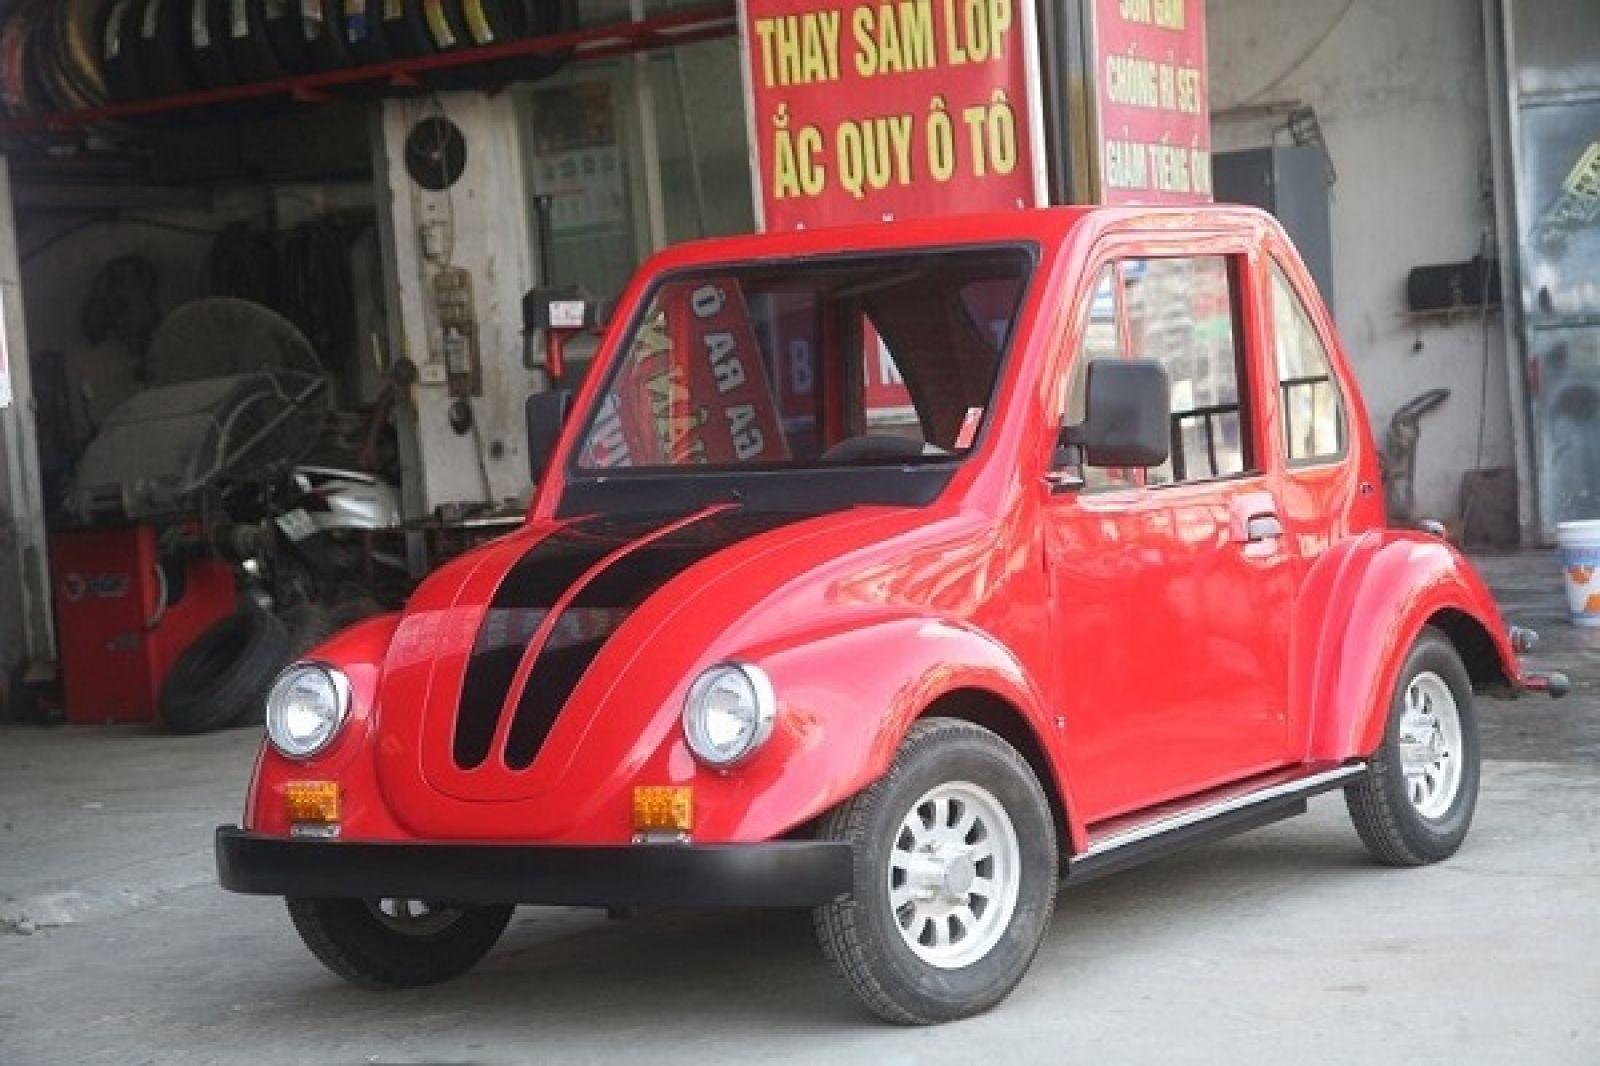 chiếc xe made in Ngô Việt Cường.